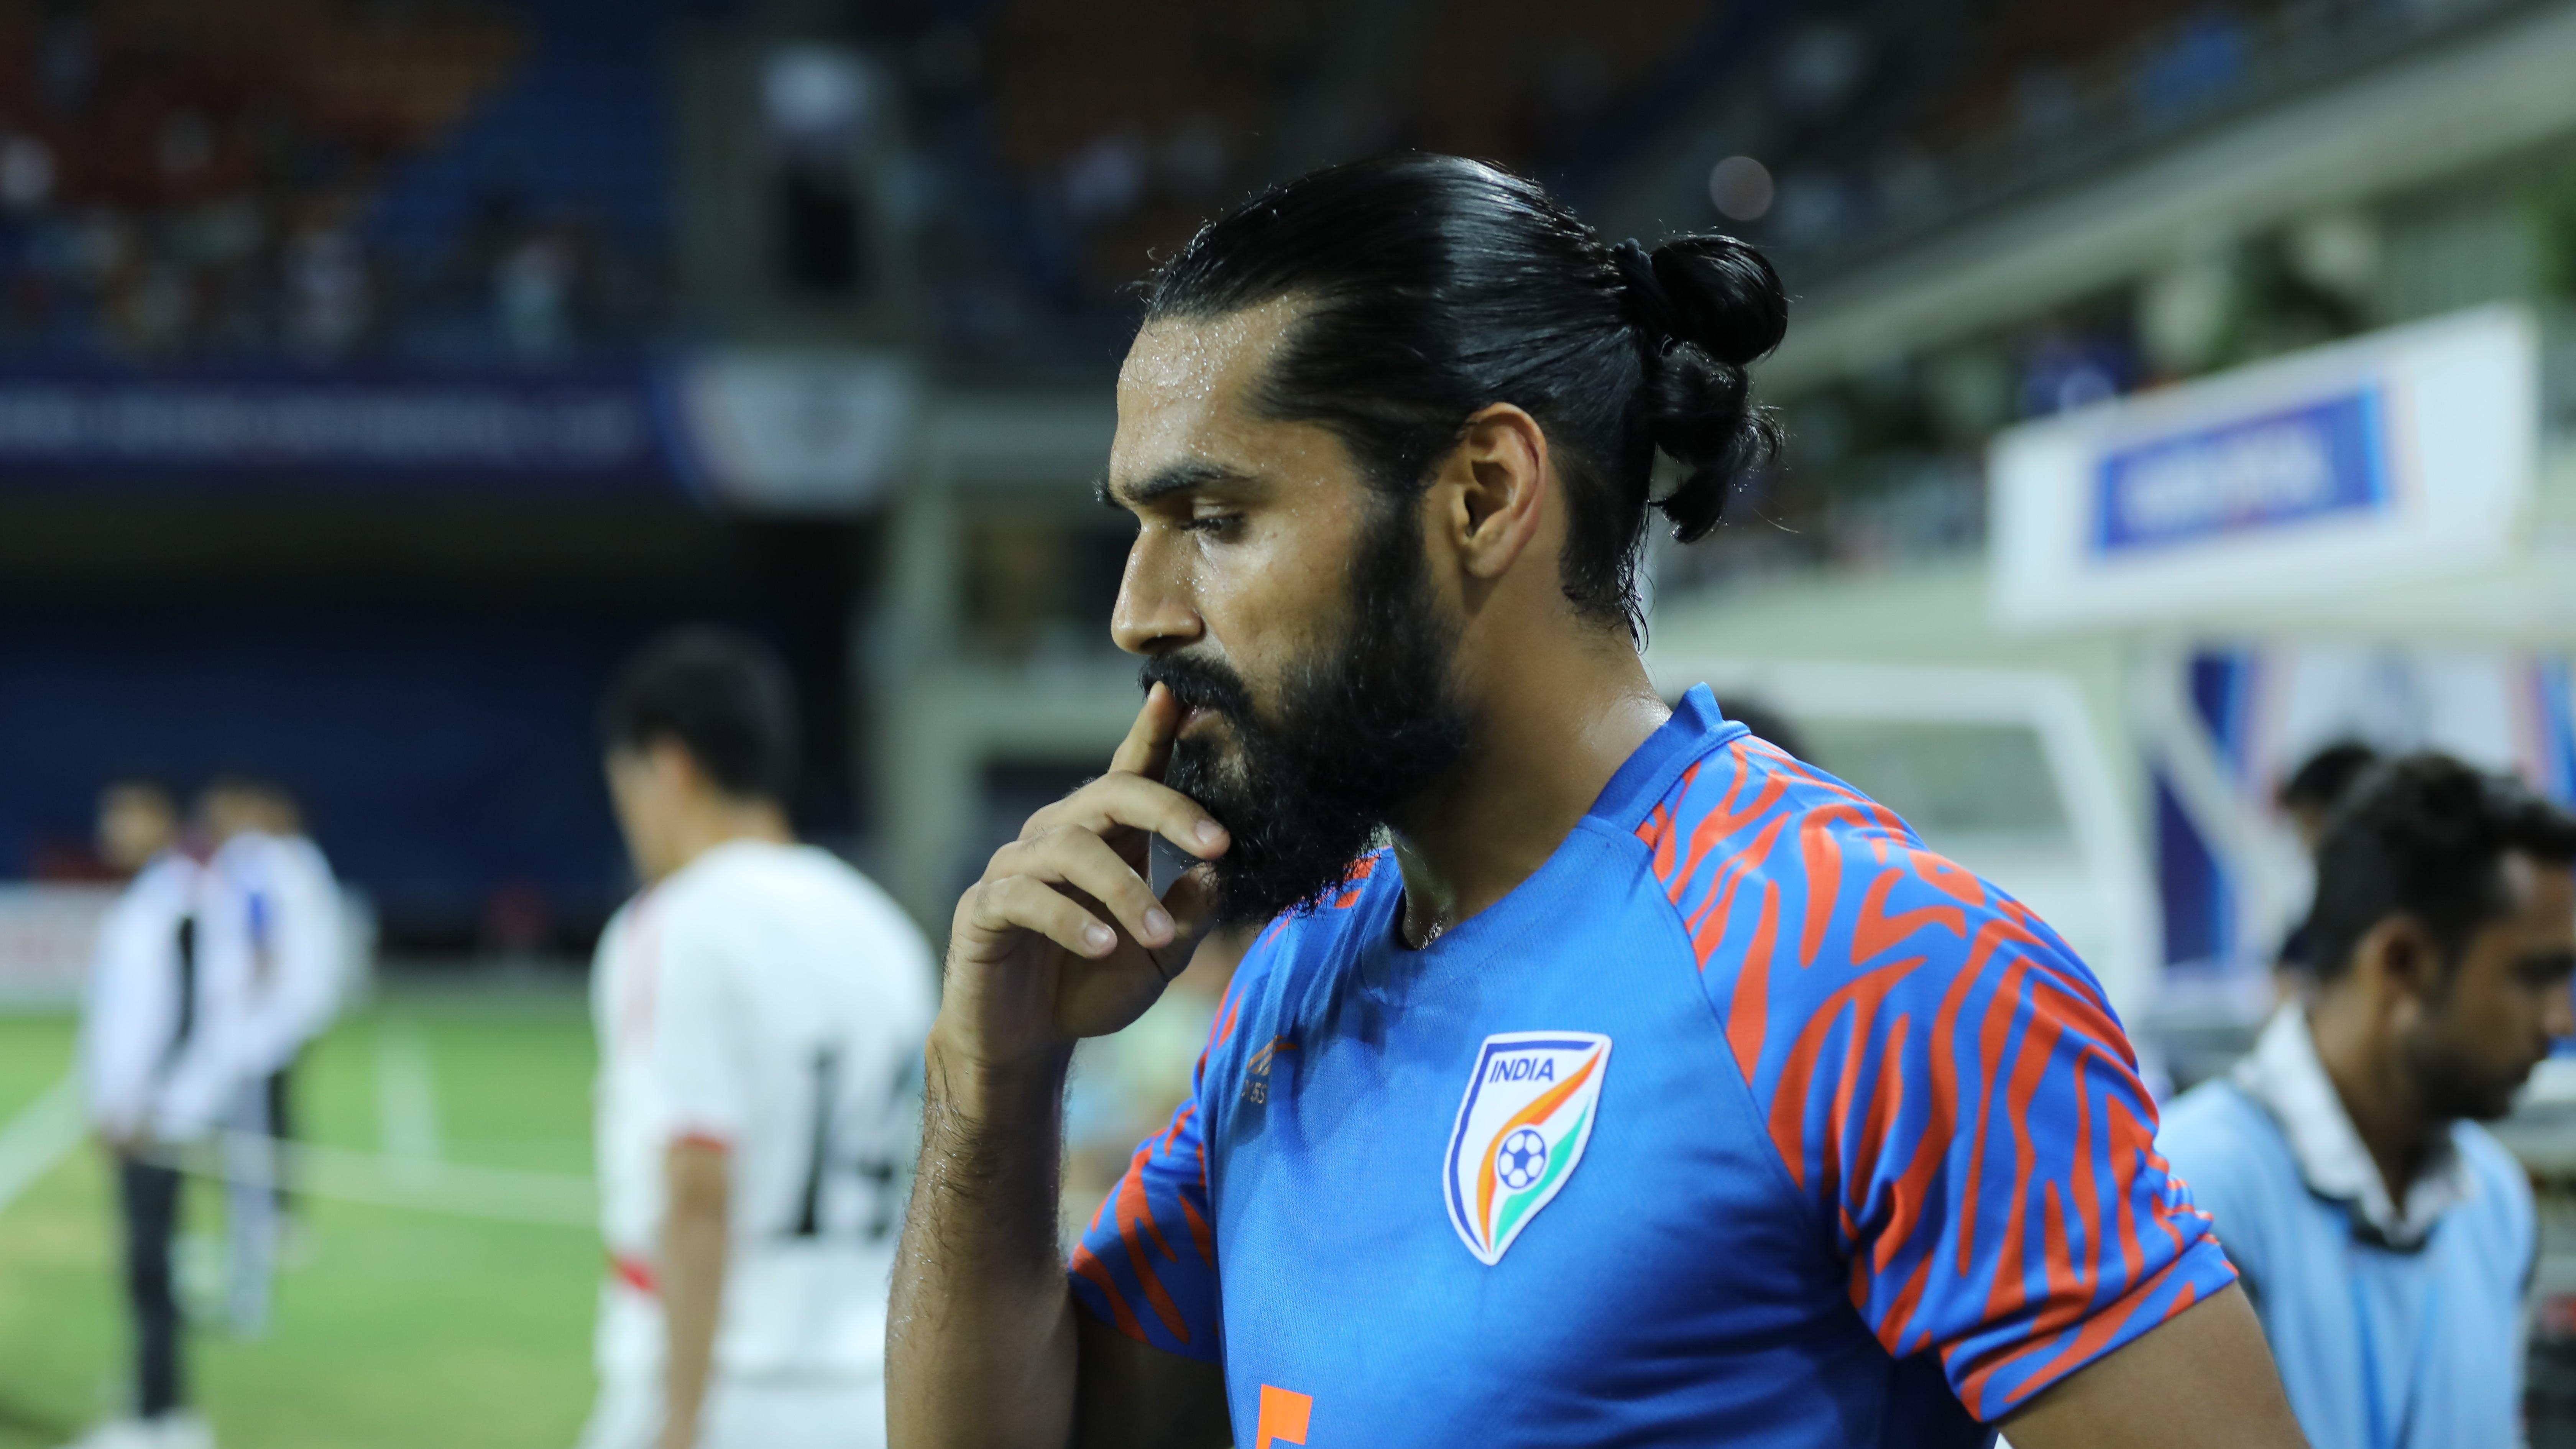 Sandesh Jhingan India DPR Korea Intercontinental Cup 2019